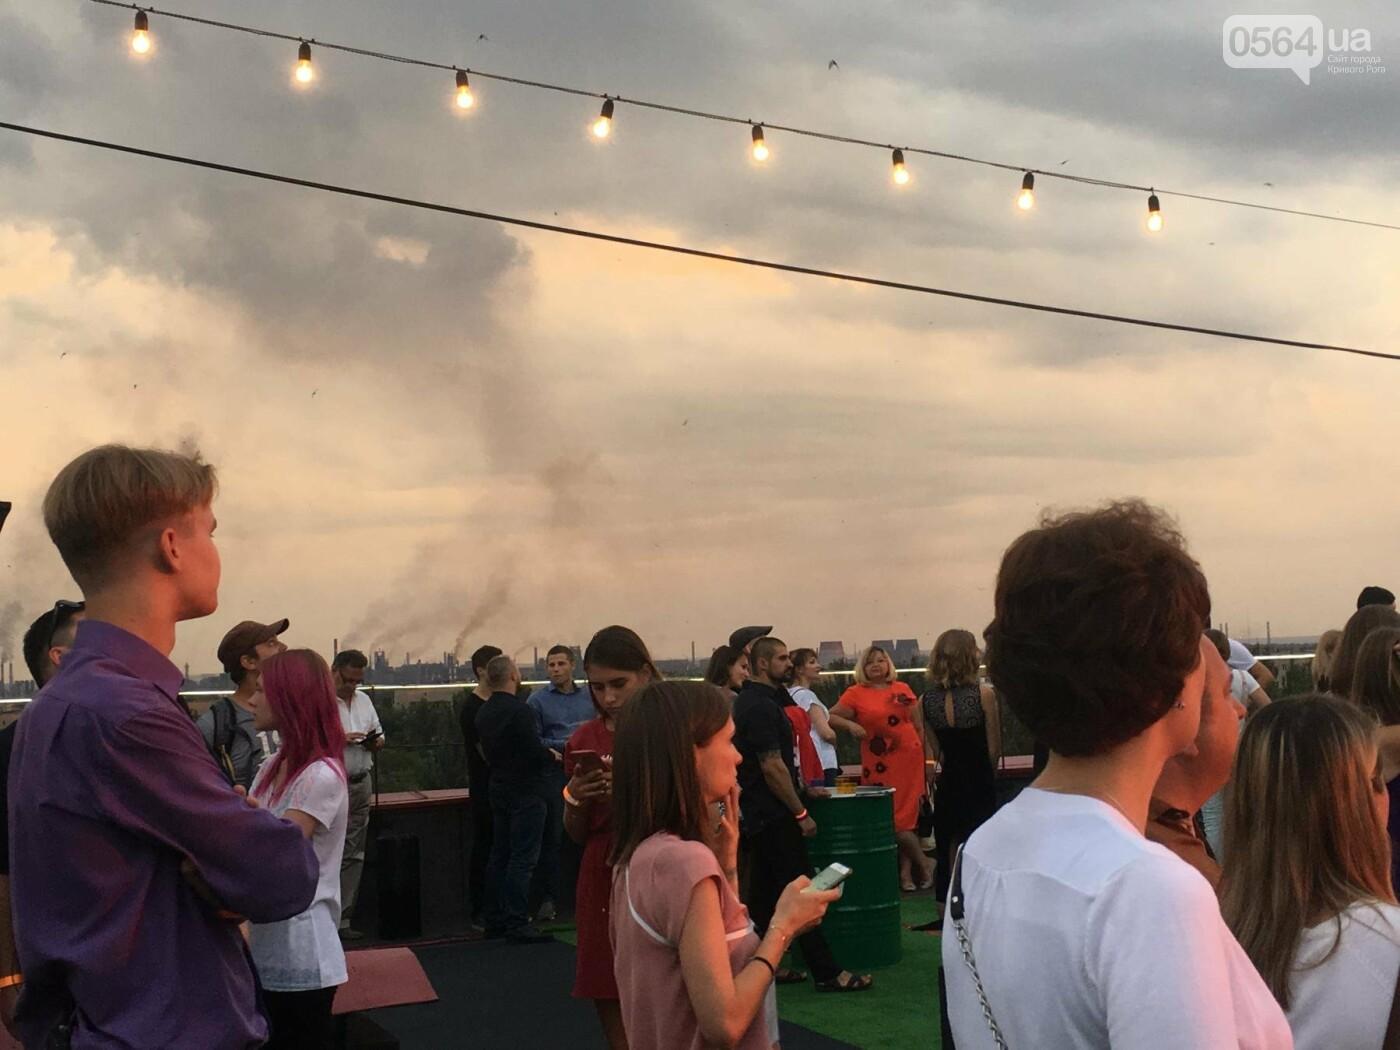 Сотни криворожан встречали закат на крыше отеля под мелодии джаза, - ФОТО, ВИДЕО, фото-17